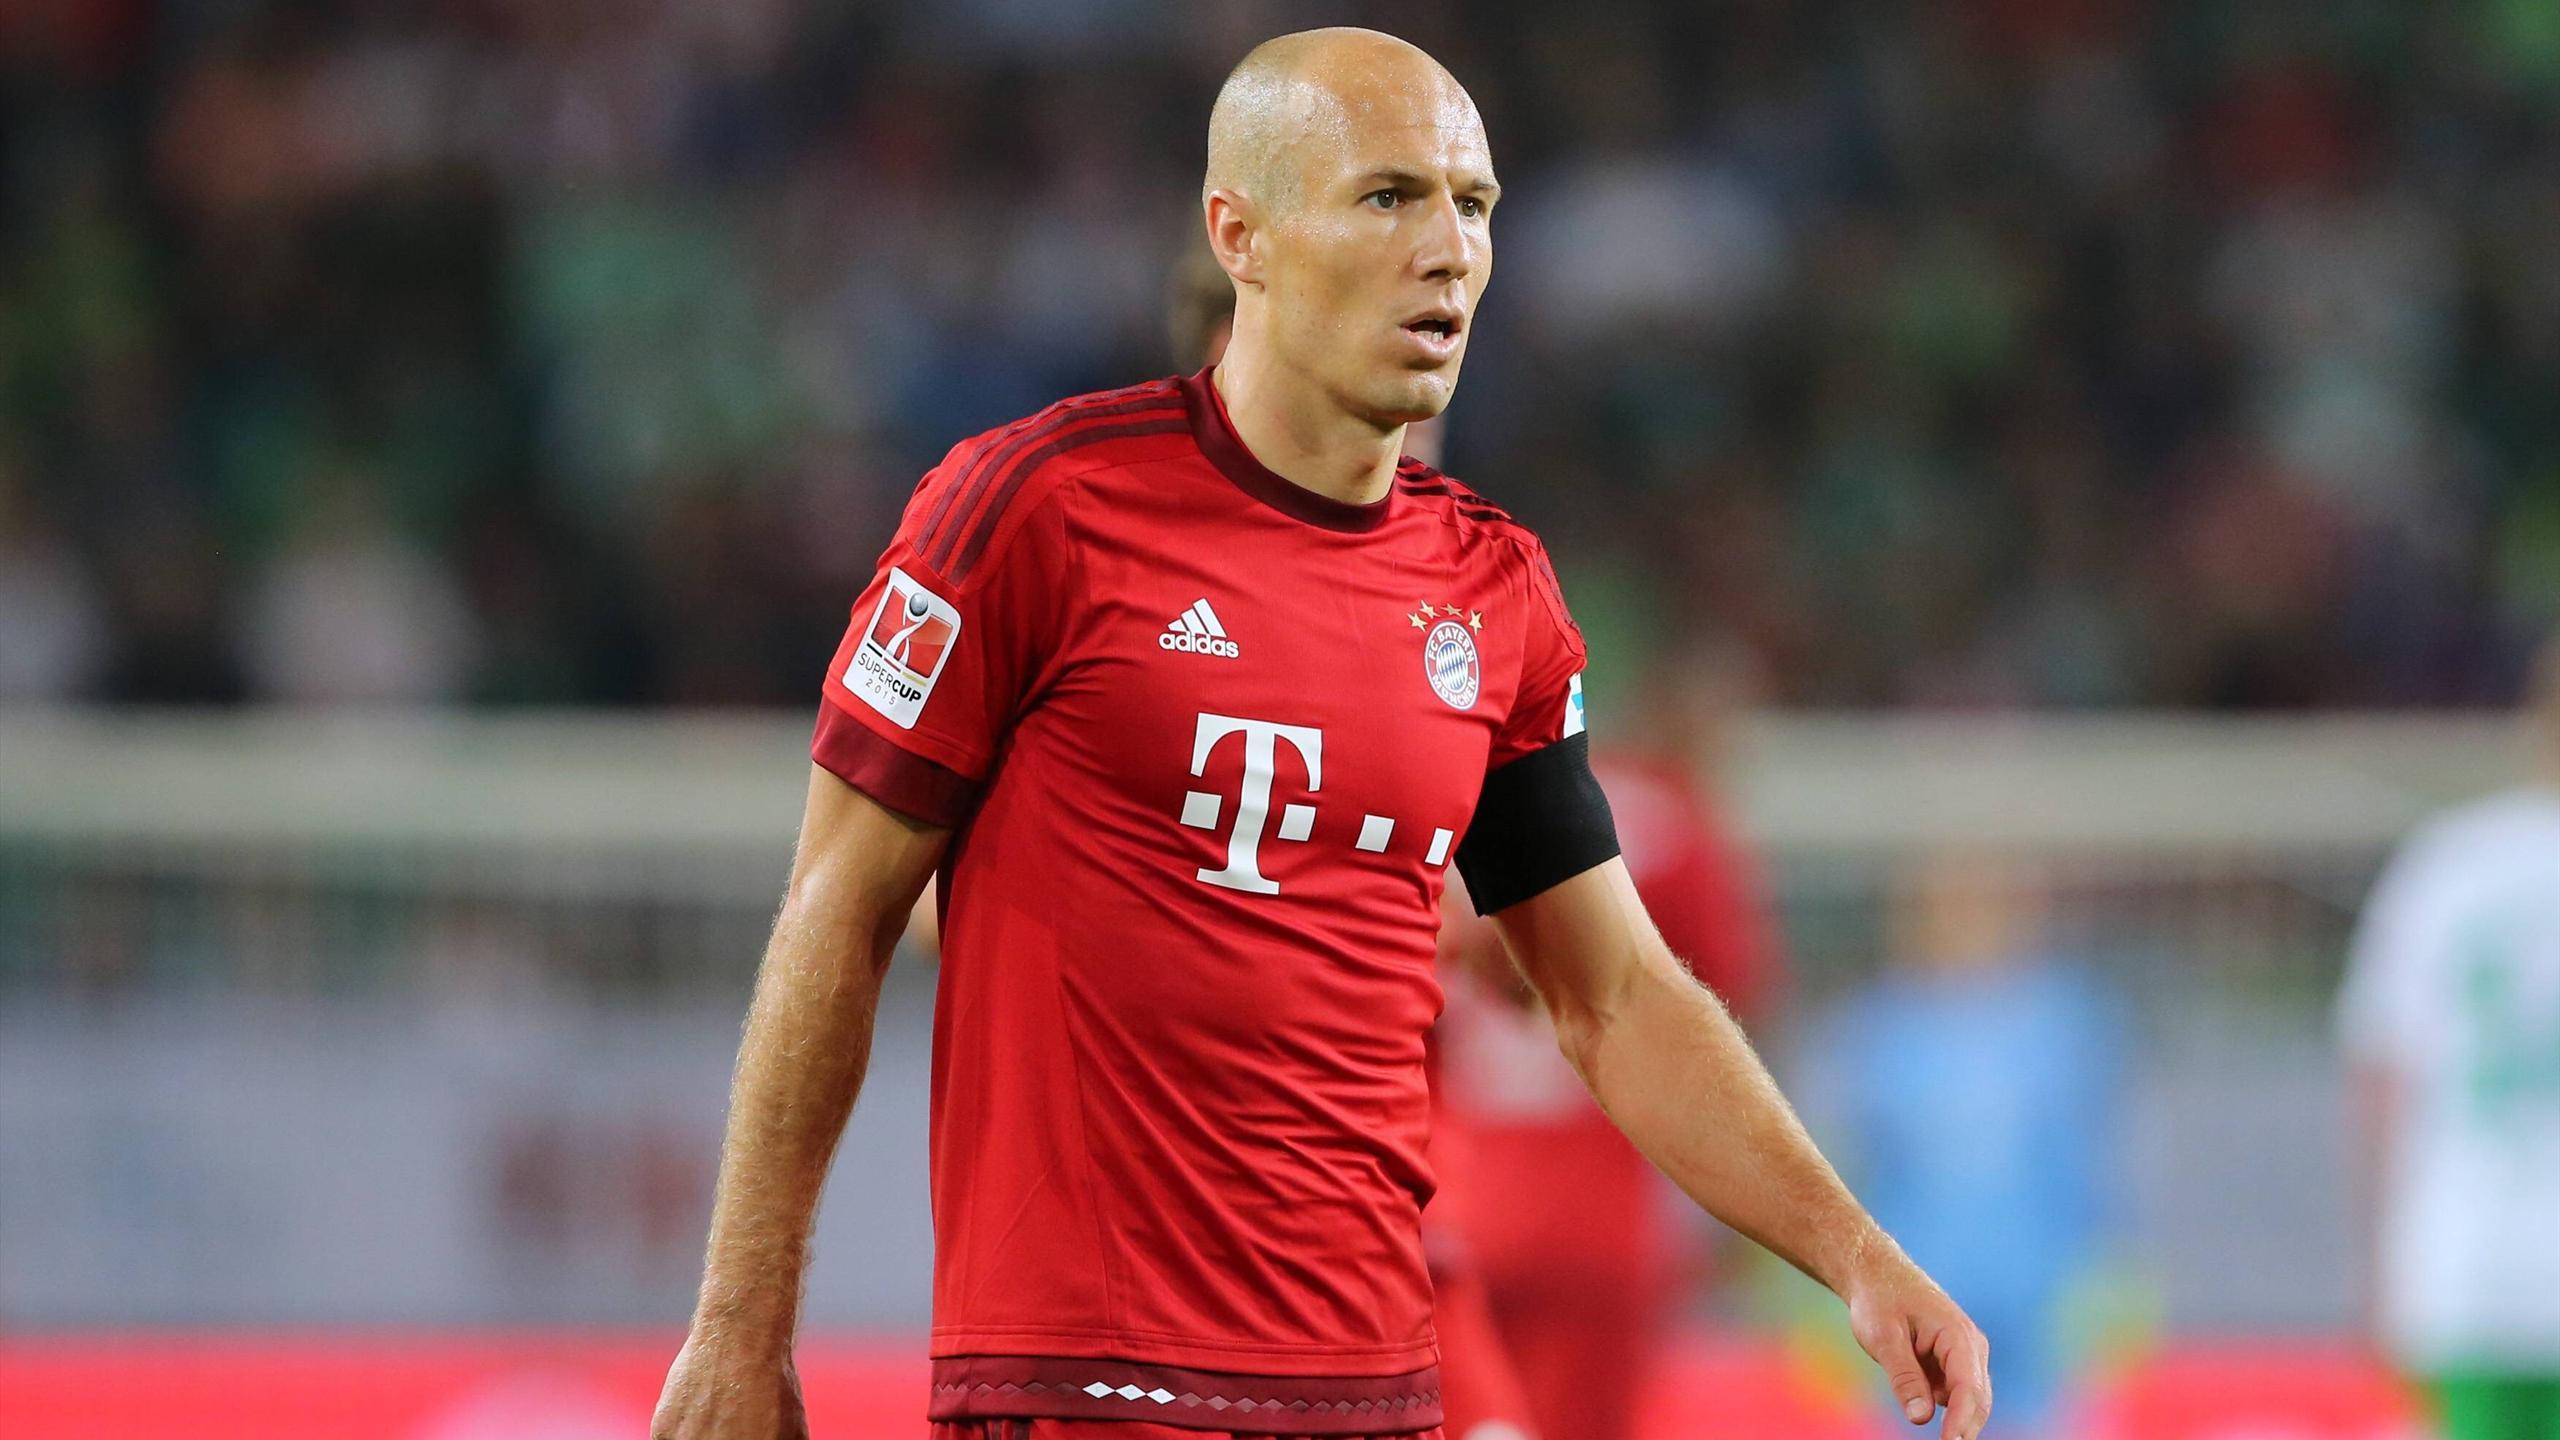 Im DFB-Pokal im Kader der Bayern: Arjen Robben